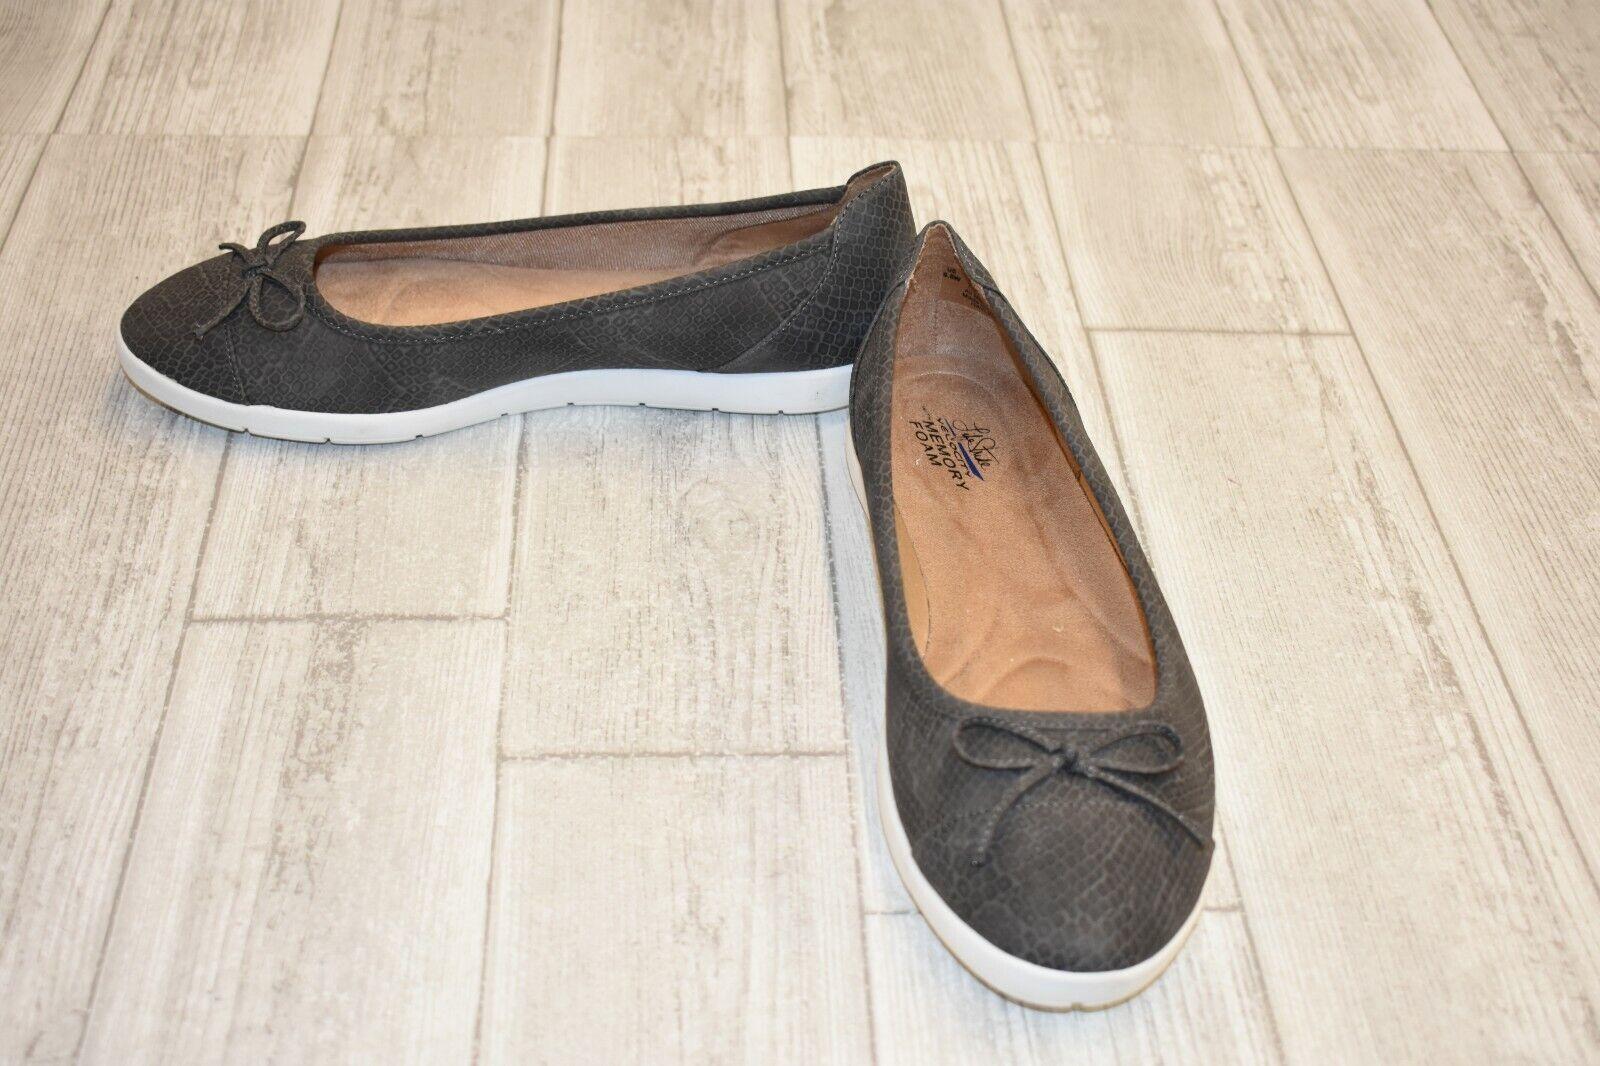 LifeStride Haylee Casual Flats - Women's Size 9.5 W - Grey